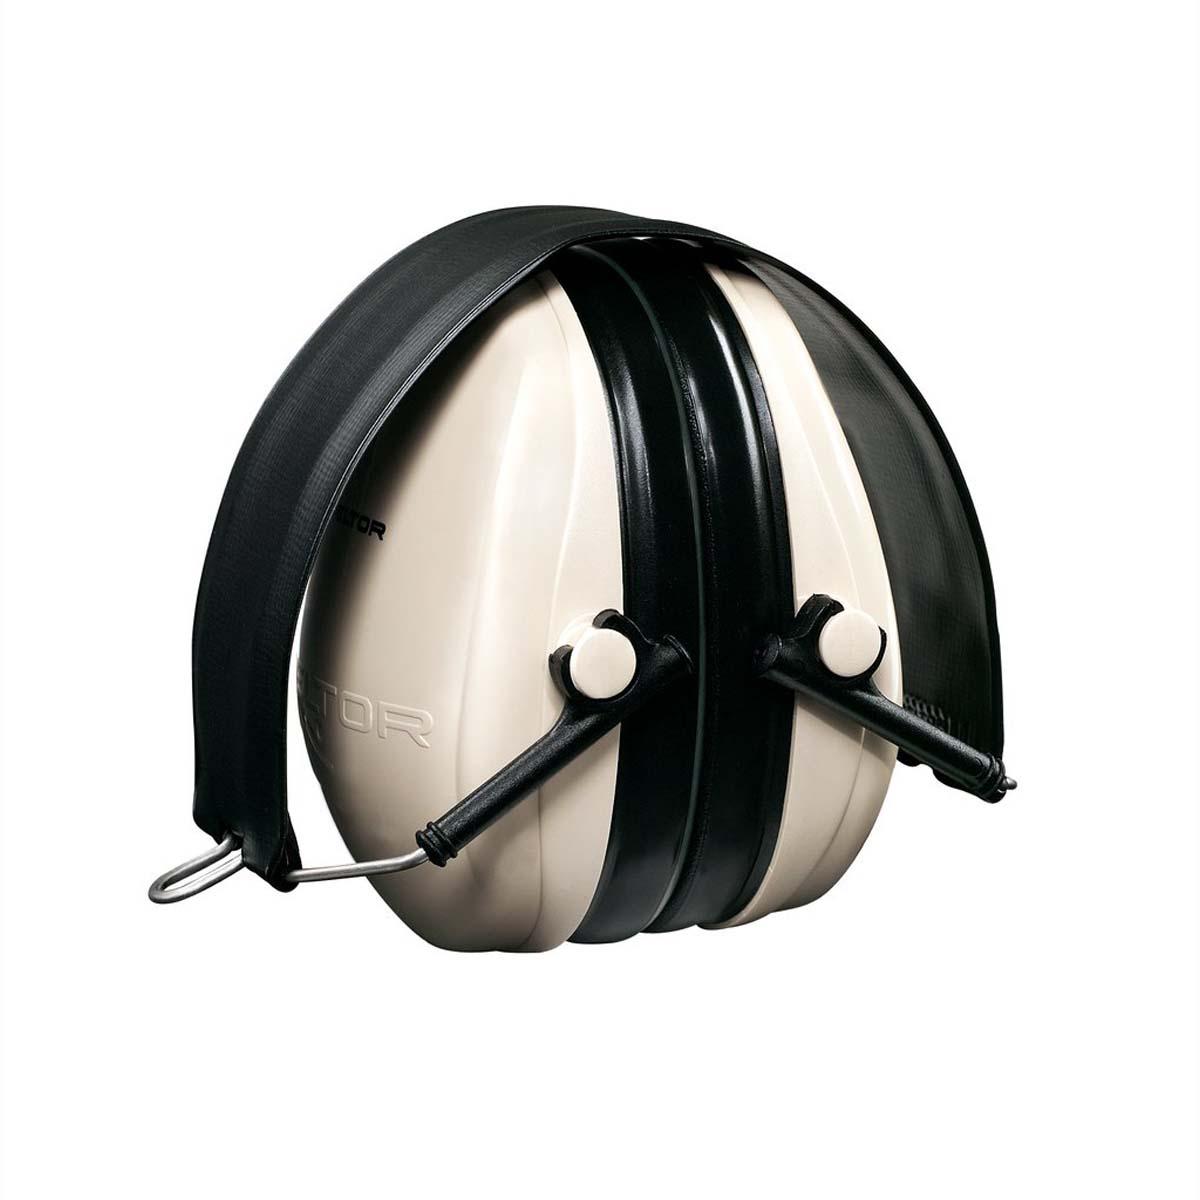 "3Mâ""¢ PELTORâ""¢ Optimeâ""¢ 95 Over-the-Head Folding Earmuffs H6F/V"